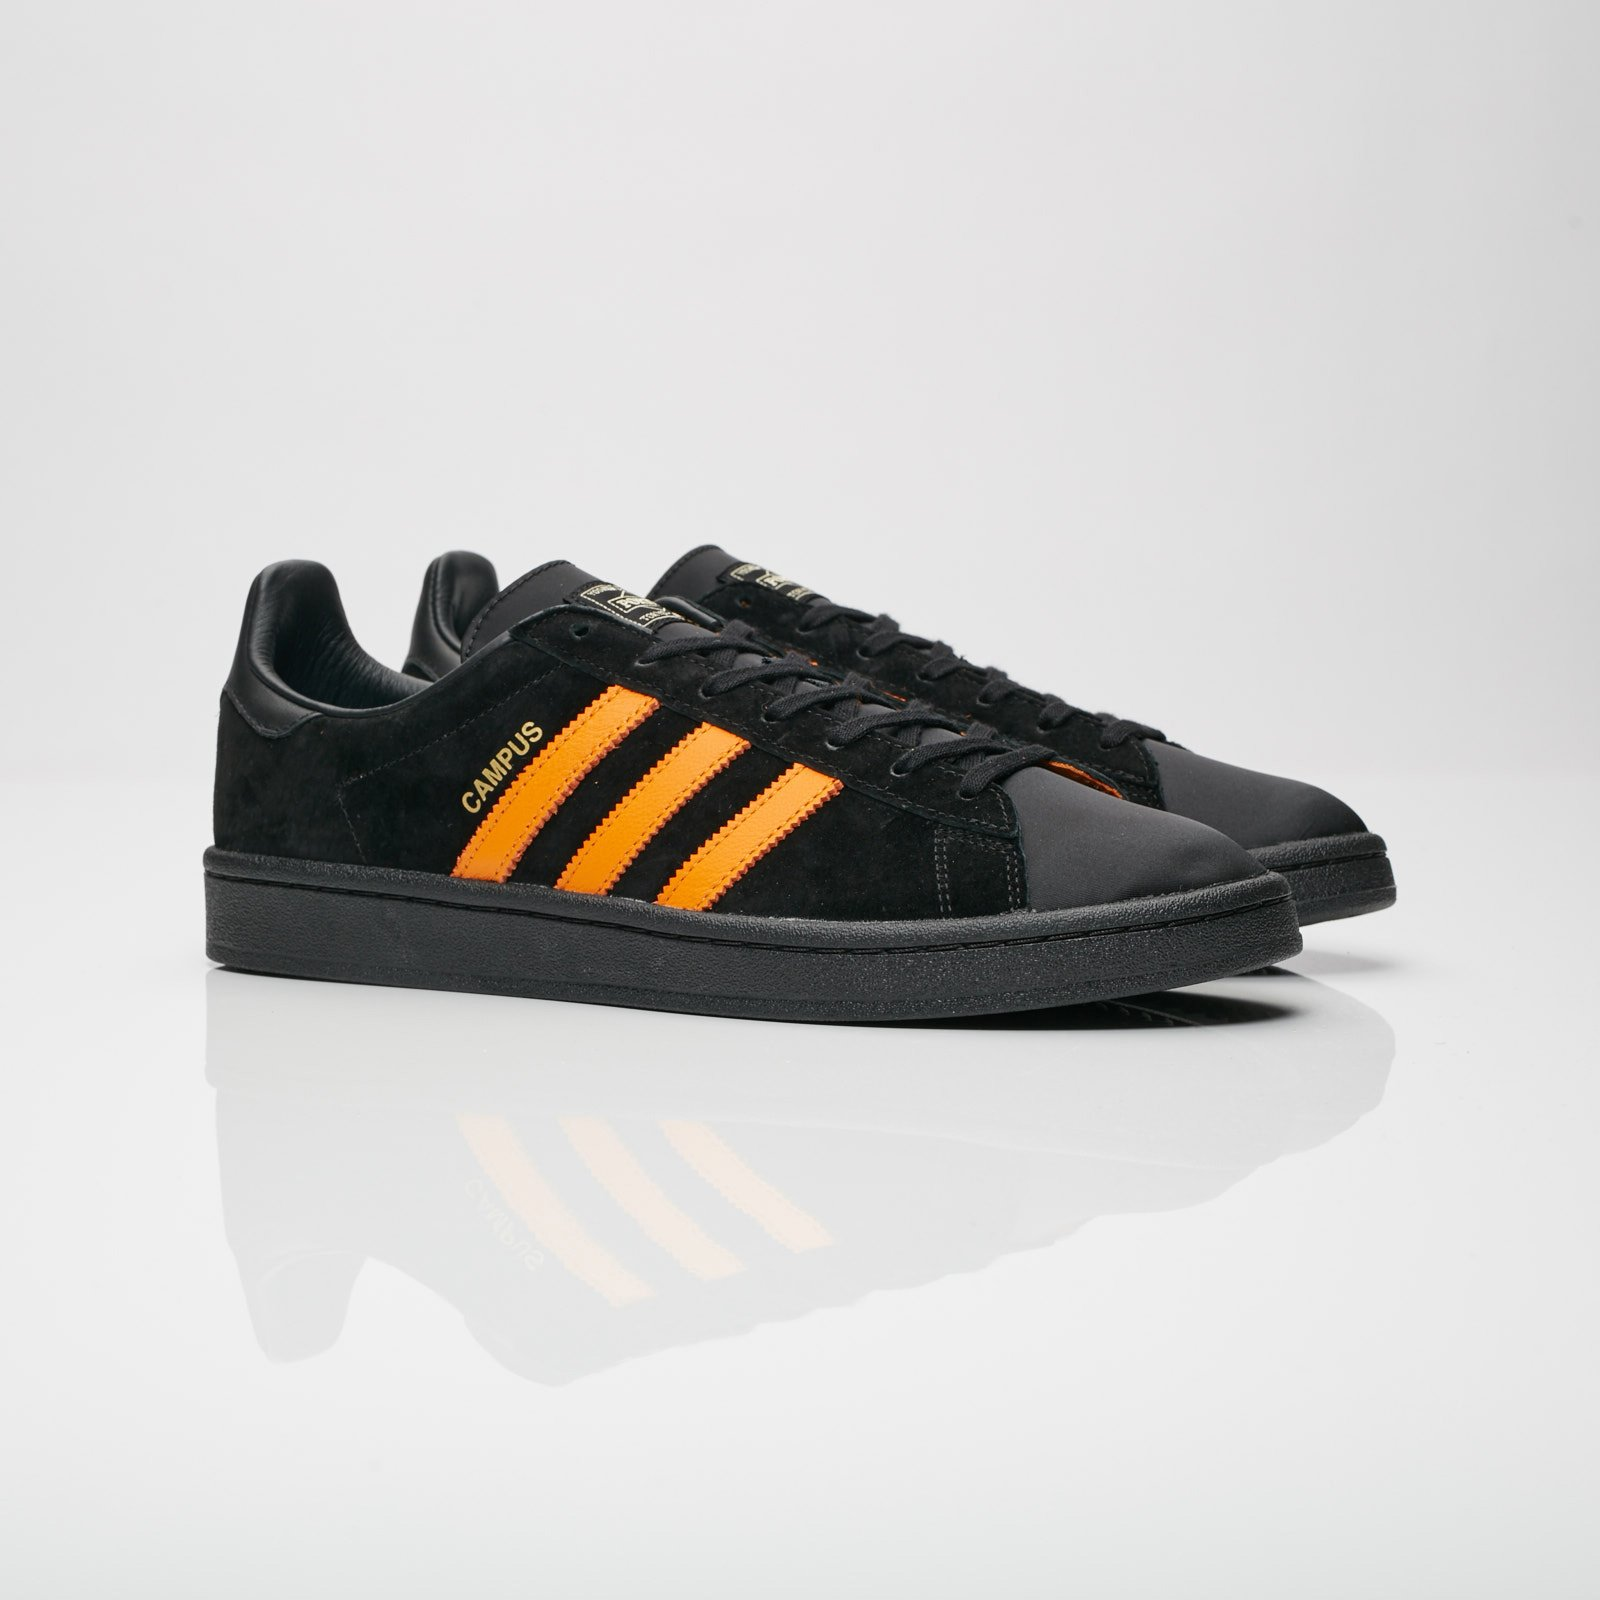 5e7711585e8 adidas Campus x Porter - B28143 - Sneakersnstuff